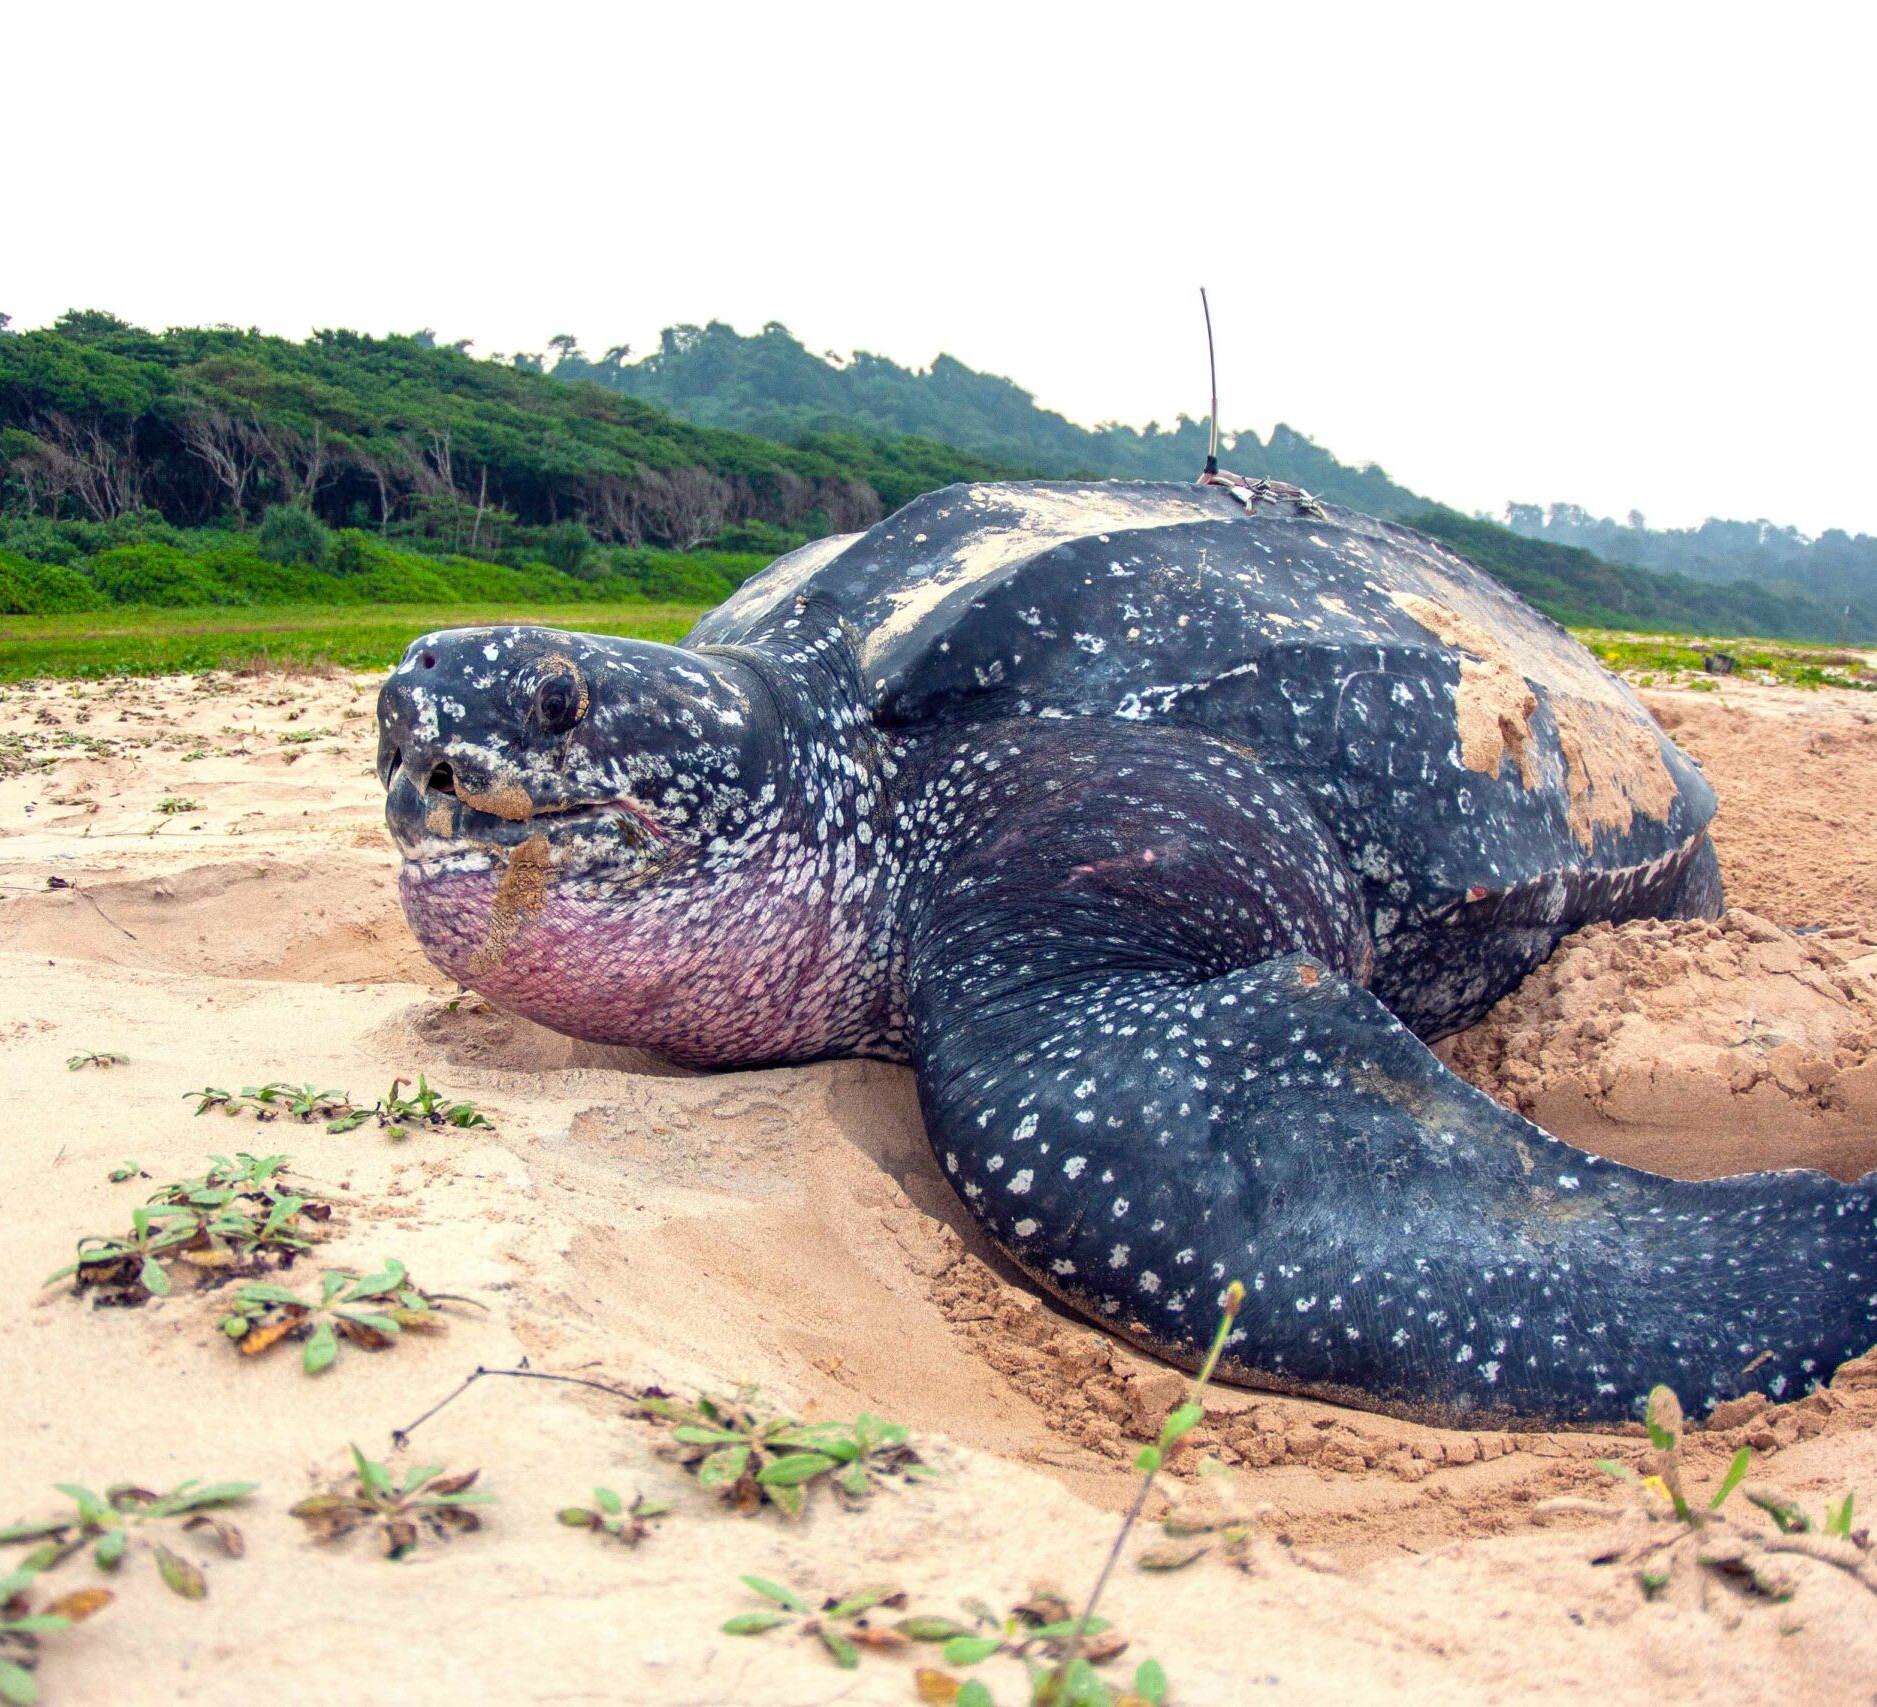 Leatherback Sea Turtles: Giants of Andaman and Nicobar Islands